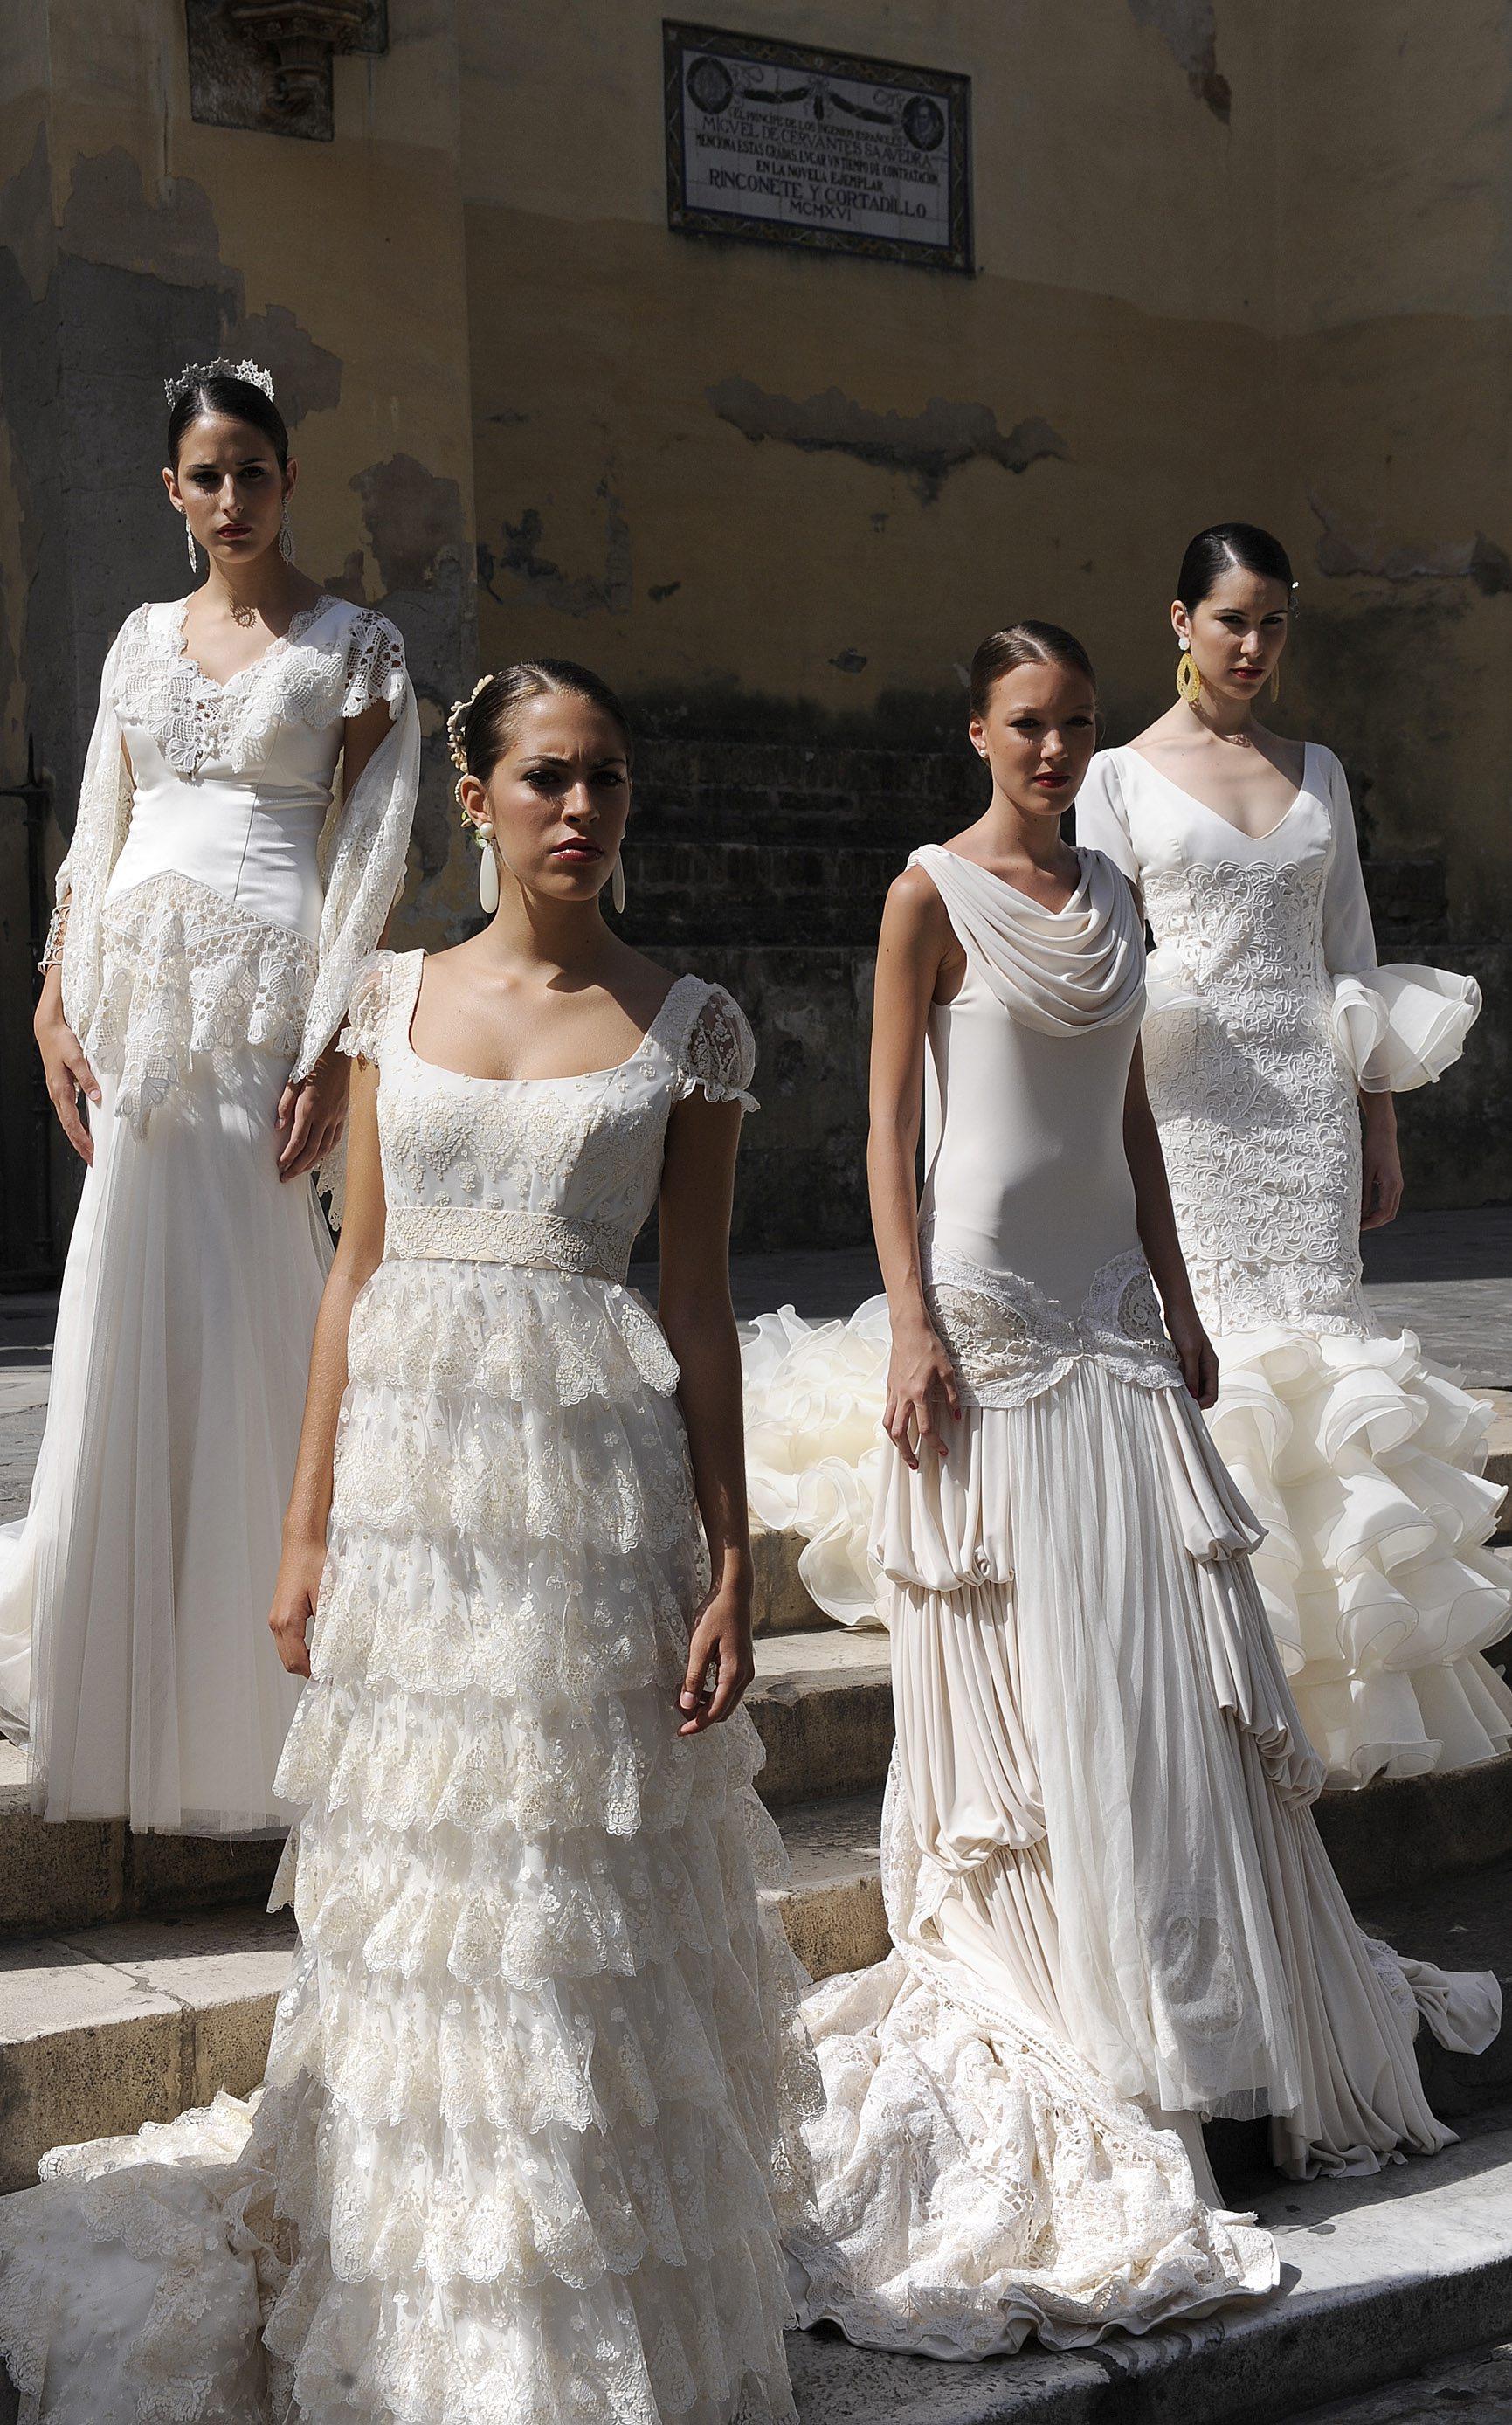 Desfile de trajes de novia de dise adores andaluces a las - Disenadores de sevilla ...